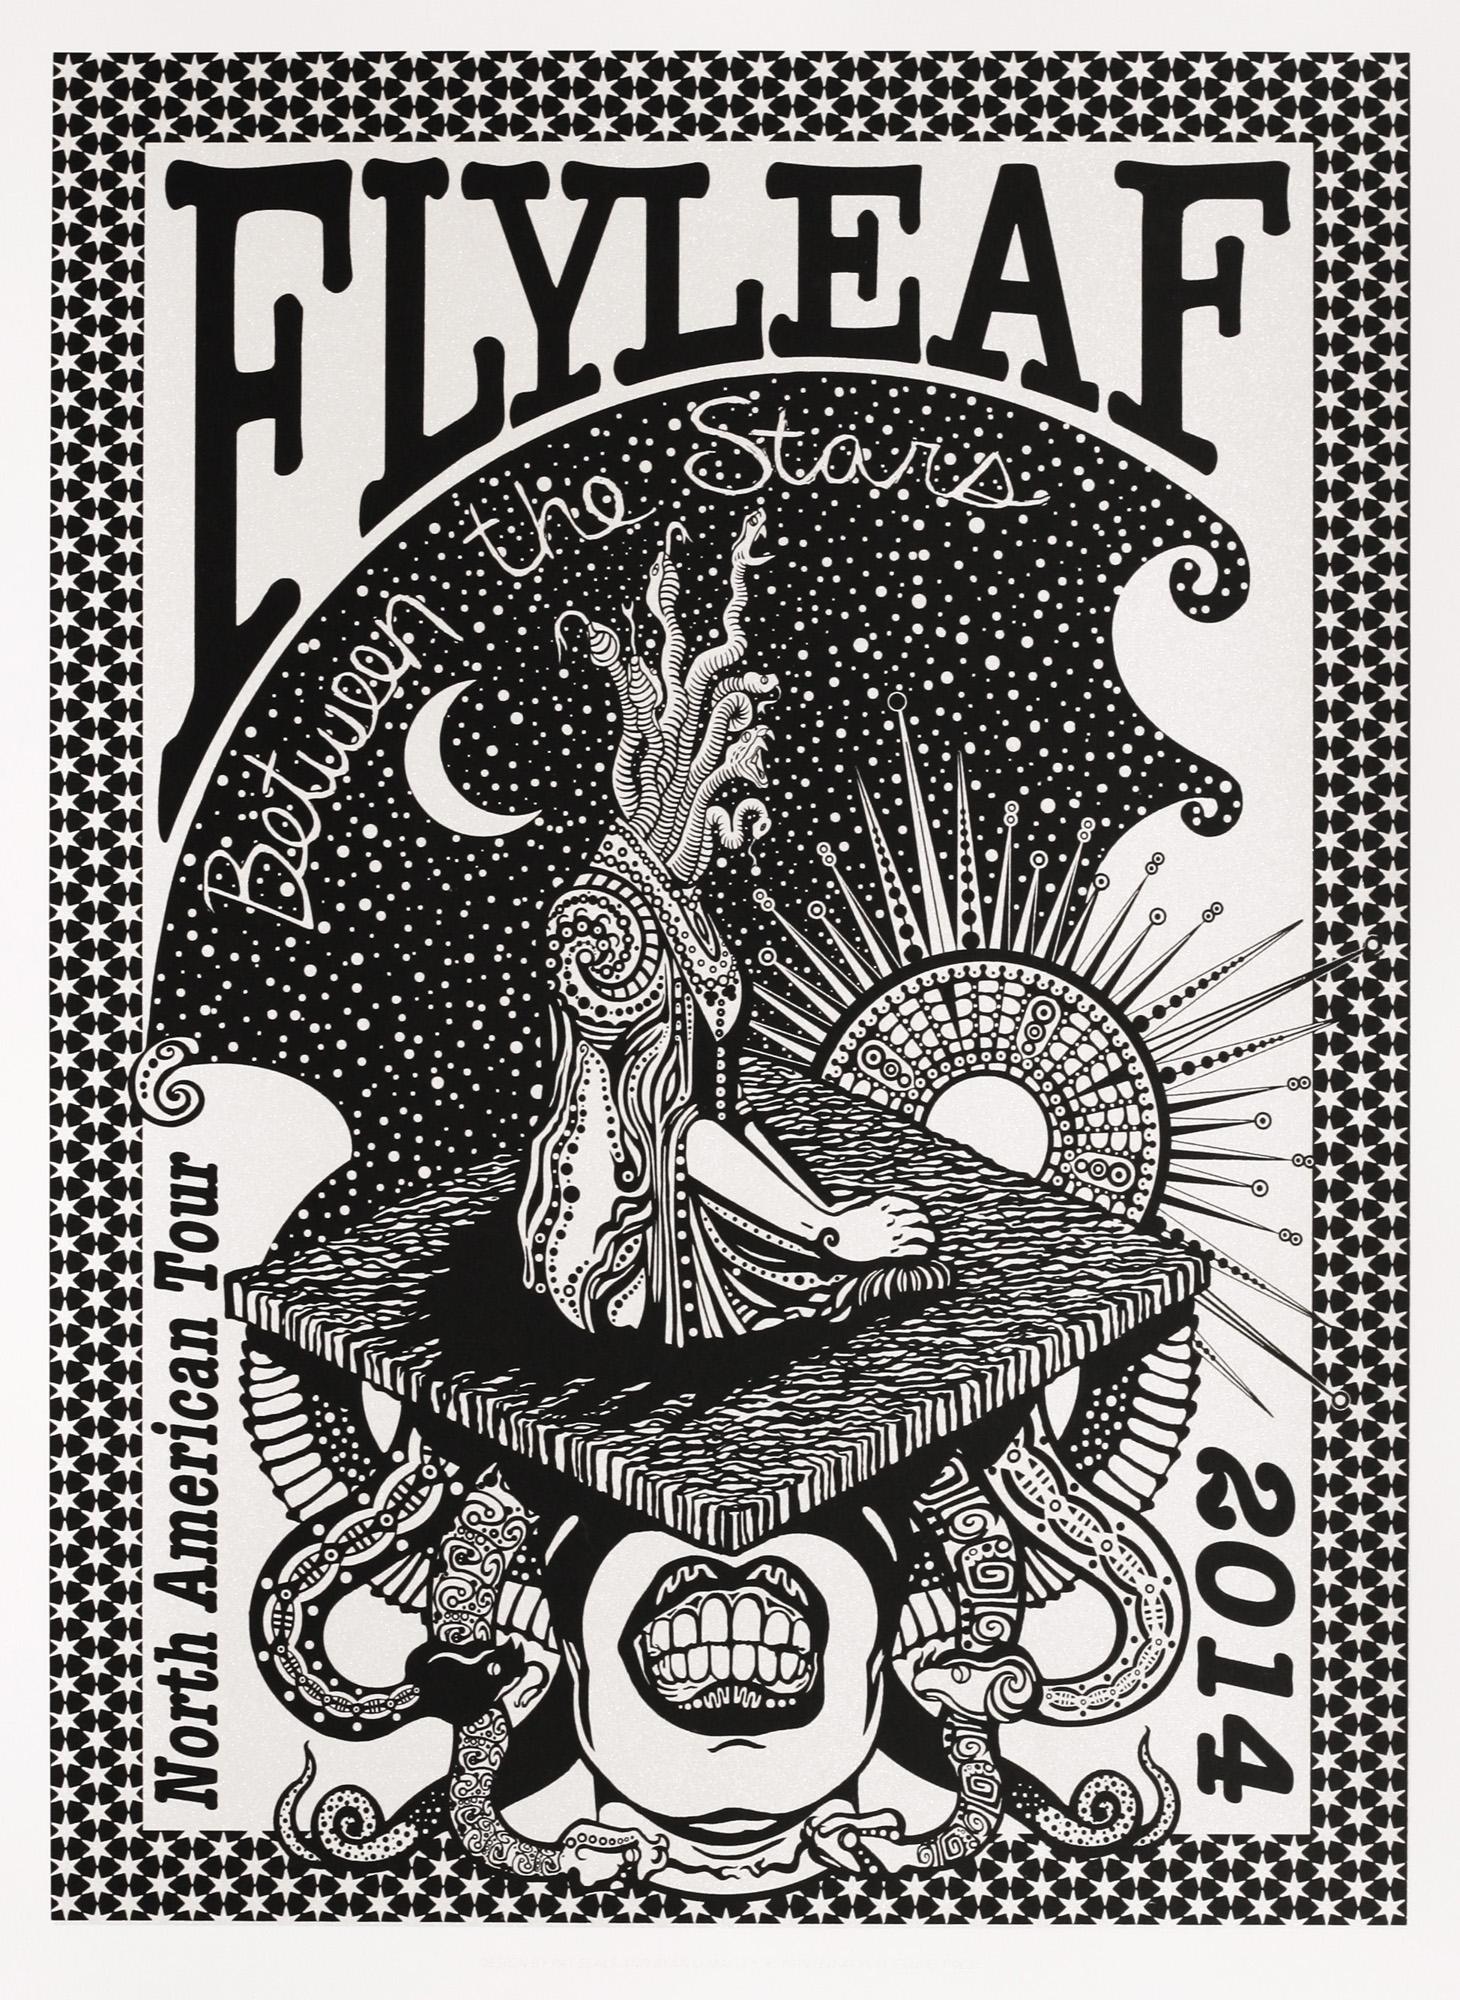 Pat Seals   Flyleaf Tour Poster   screenprint  2014